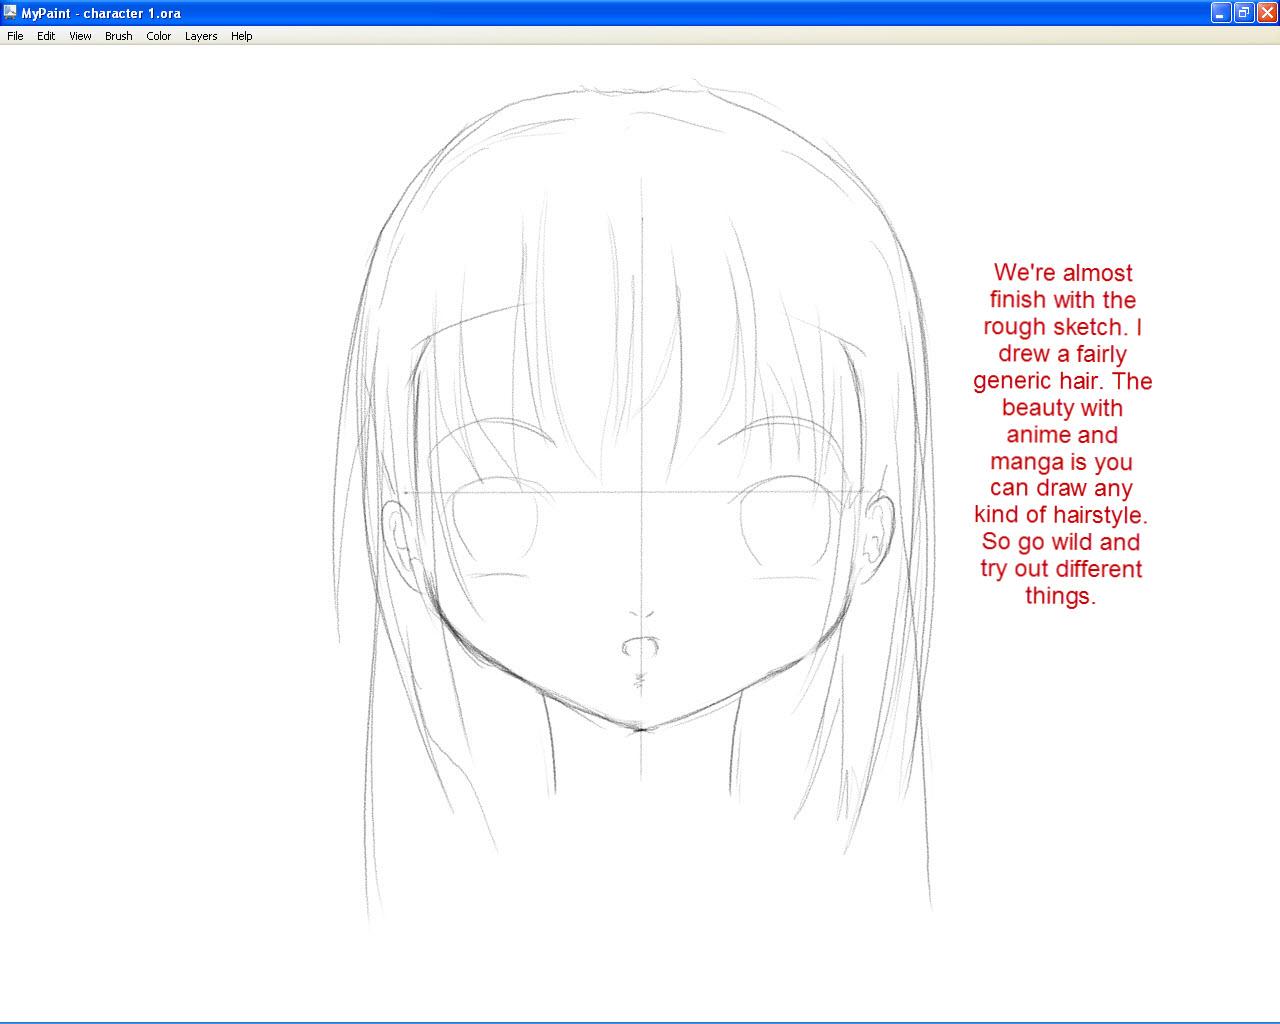 Anime Hair Side View - Hot Girls Wallpaper